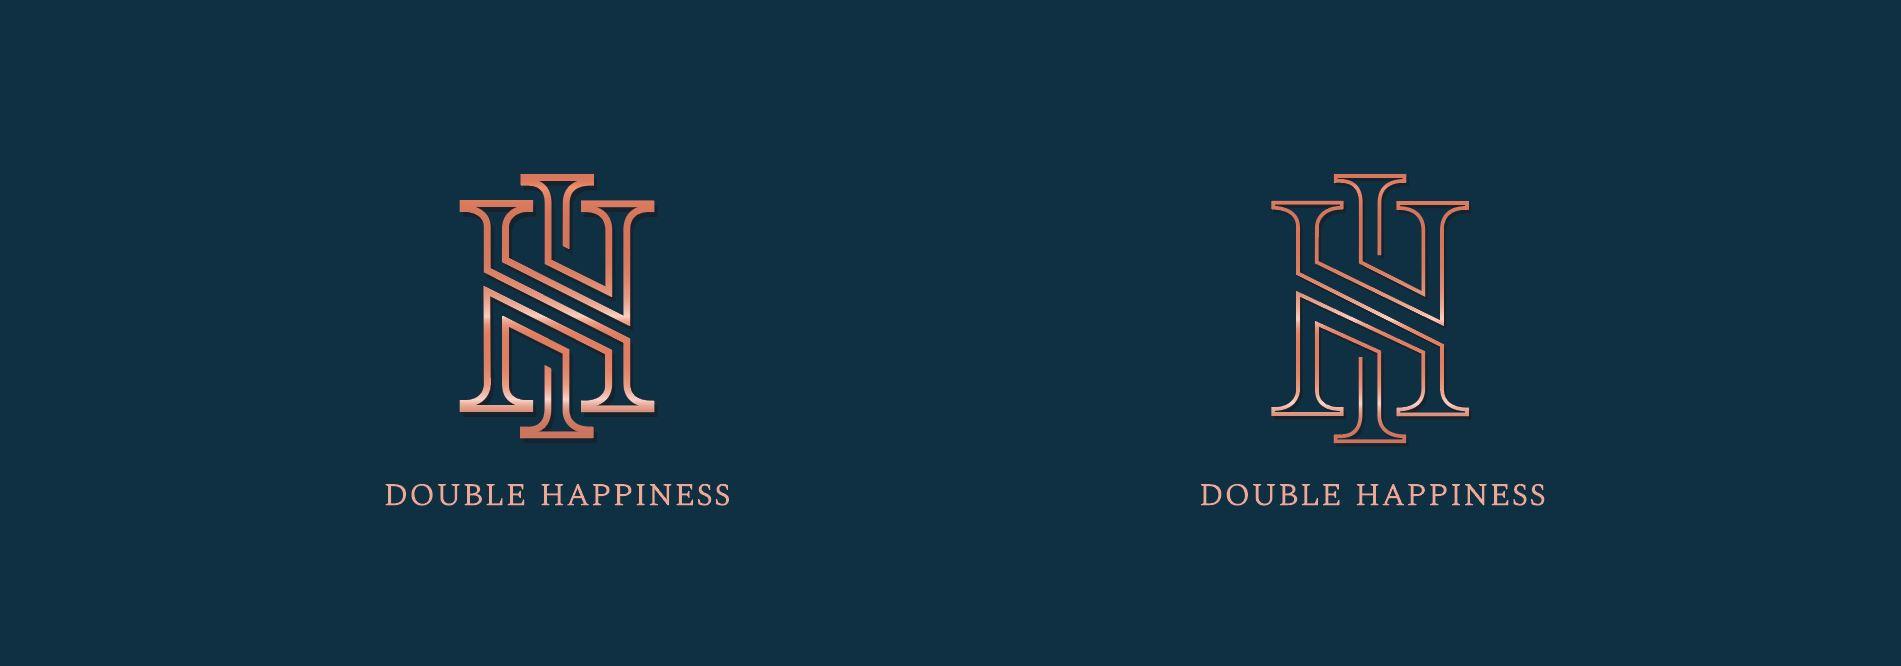 DoubleH_Logo_002.JPG